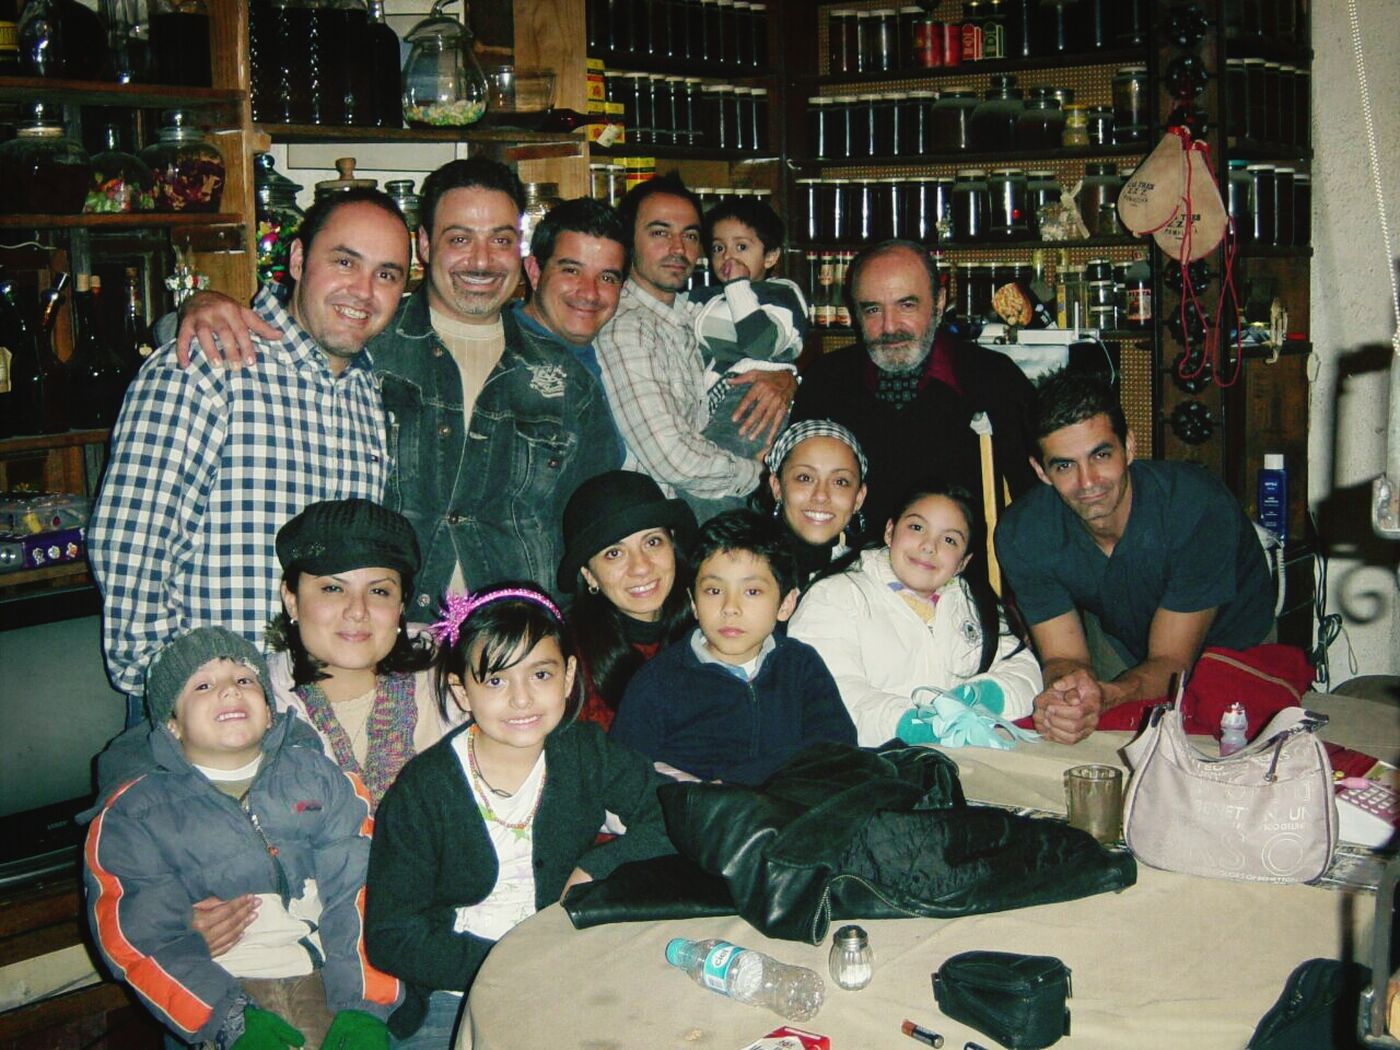 Lovemycrazyfamily